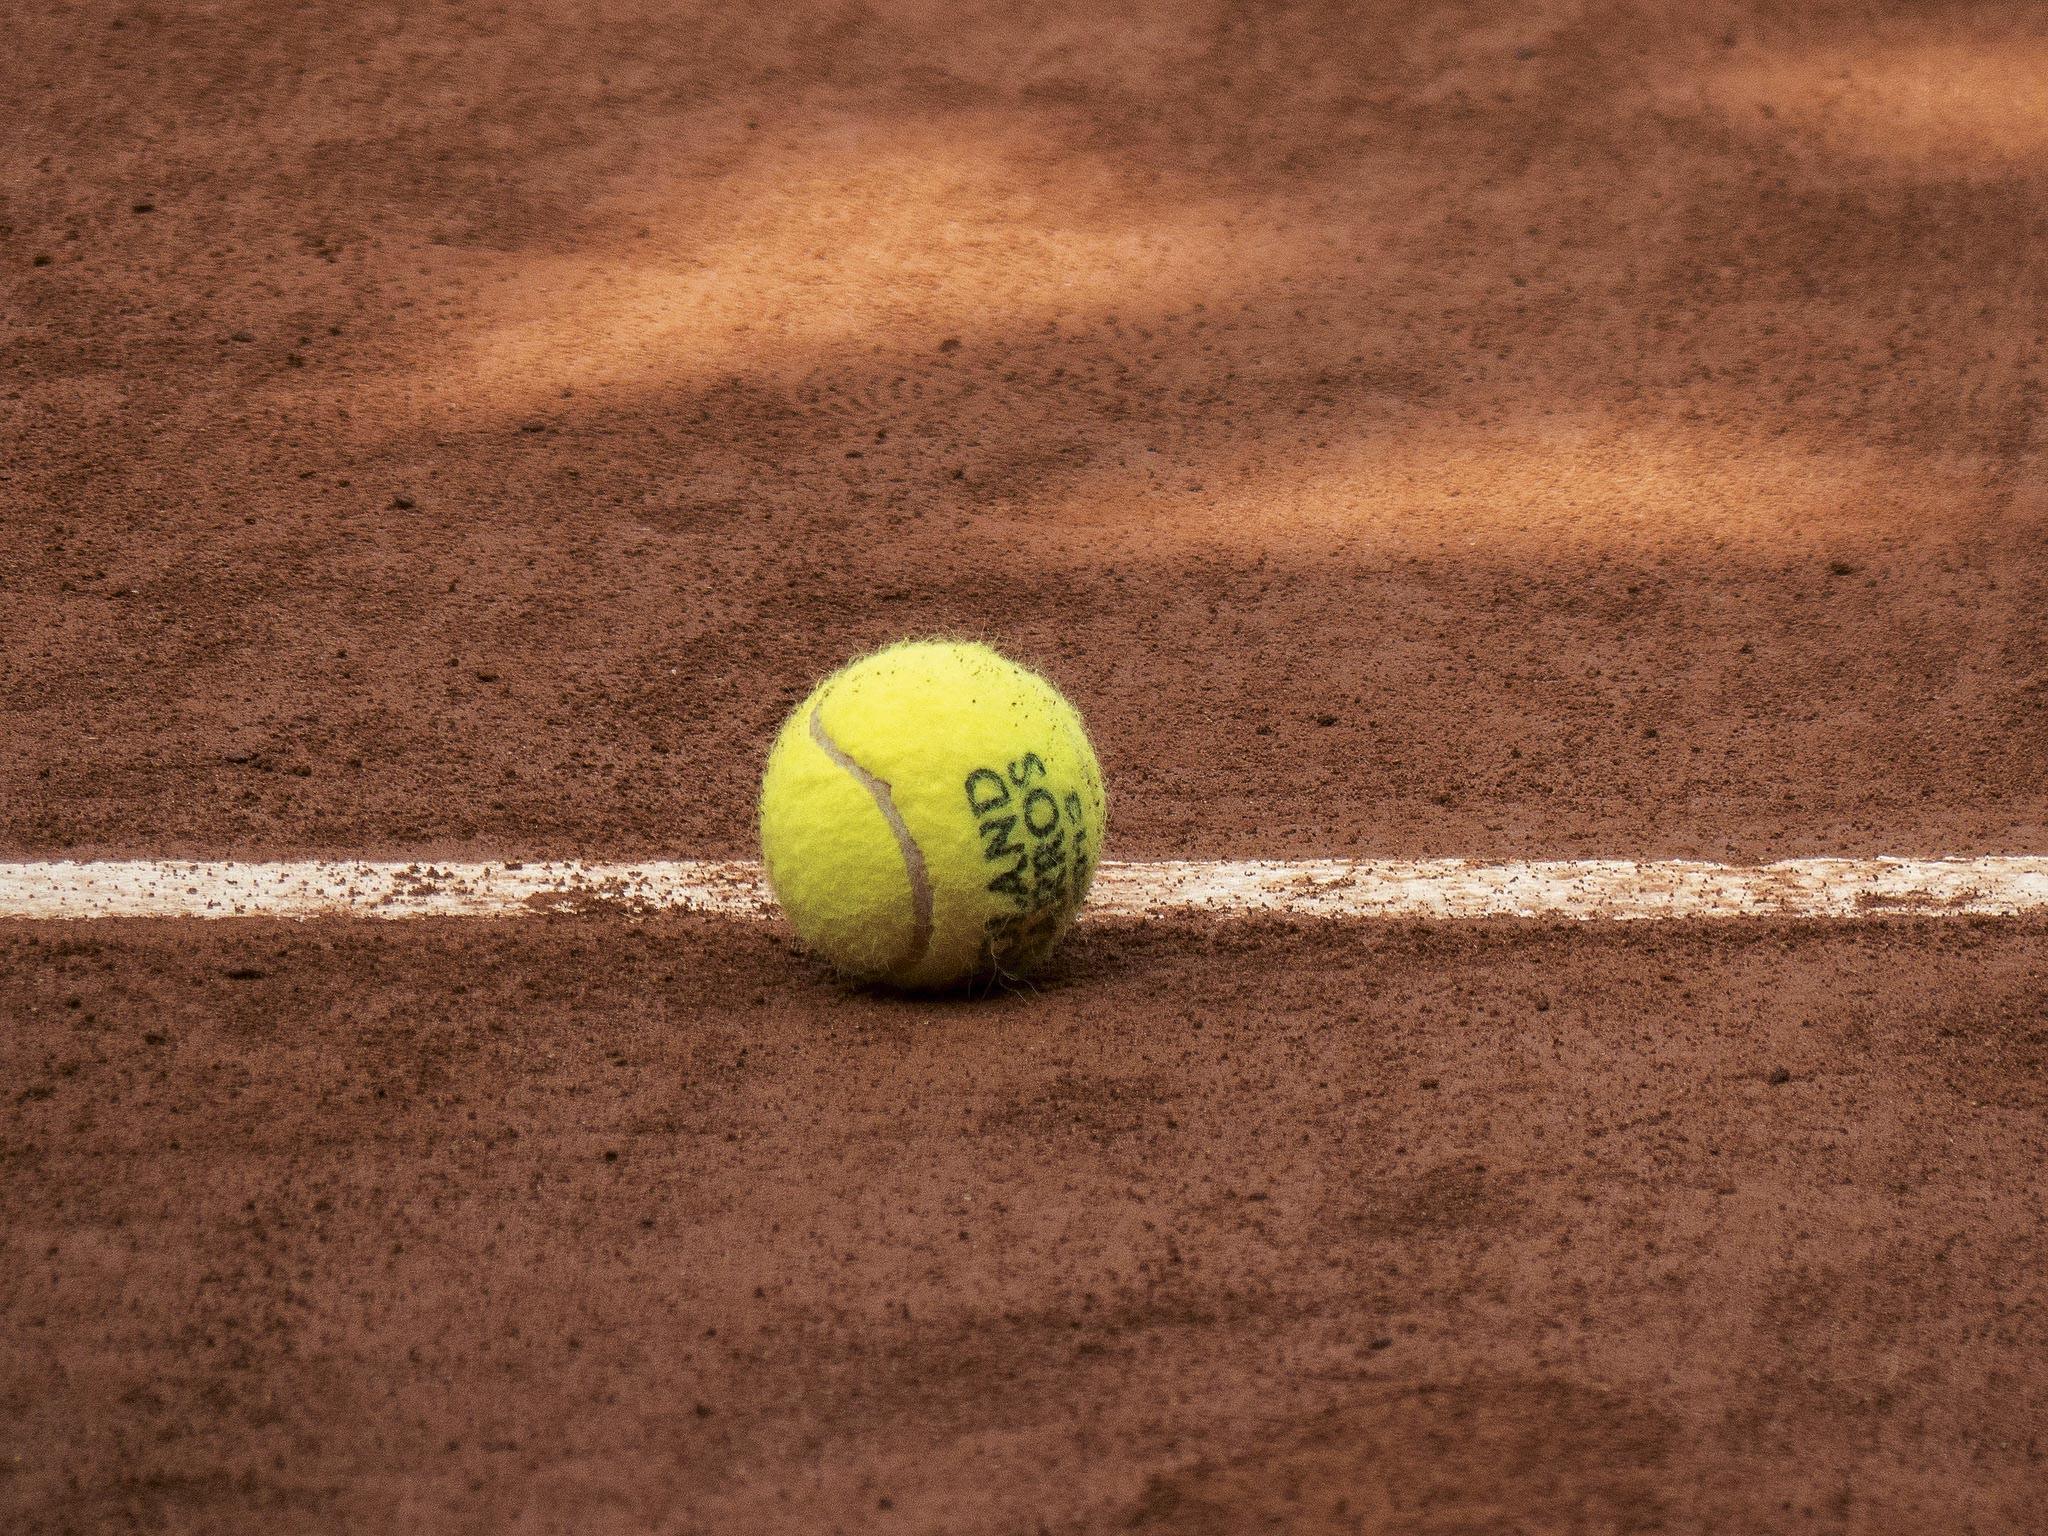 Ex. 8 Une balle de tennis